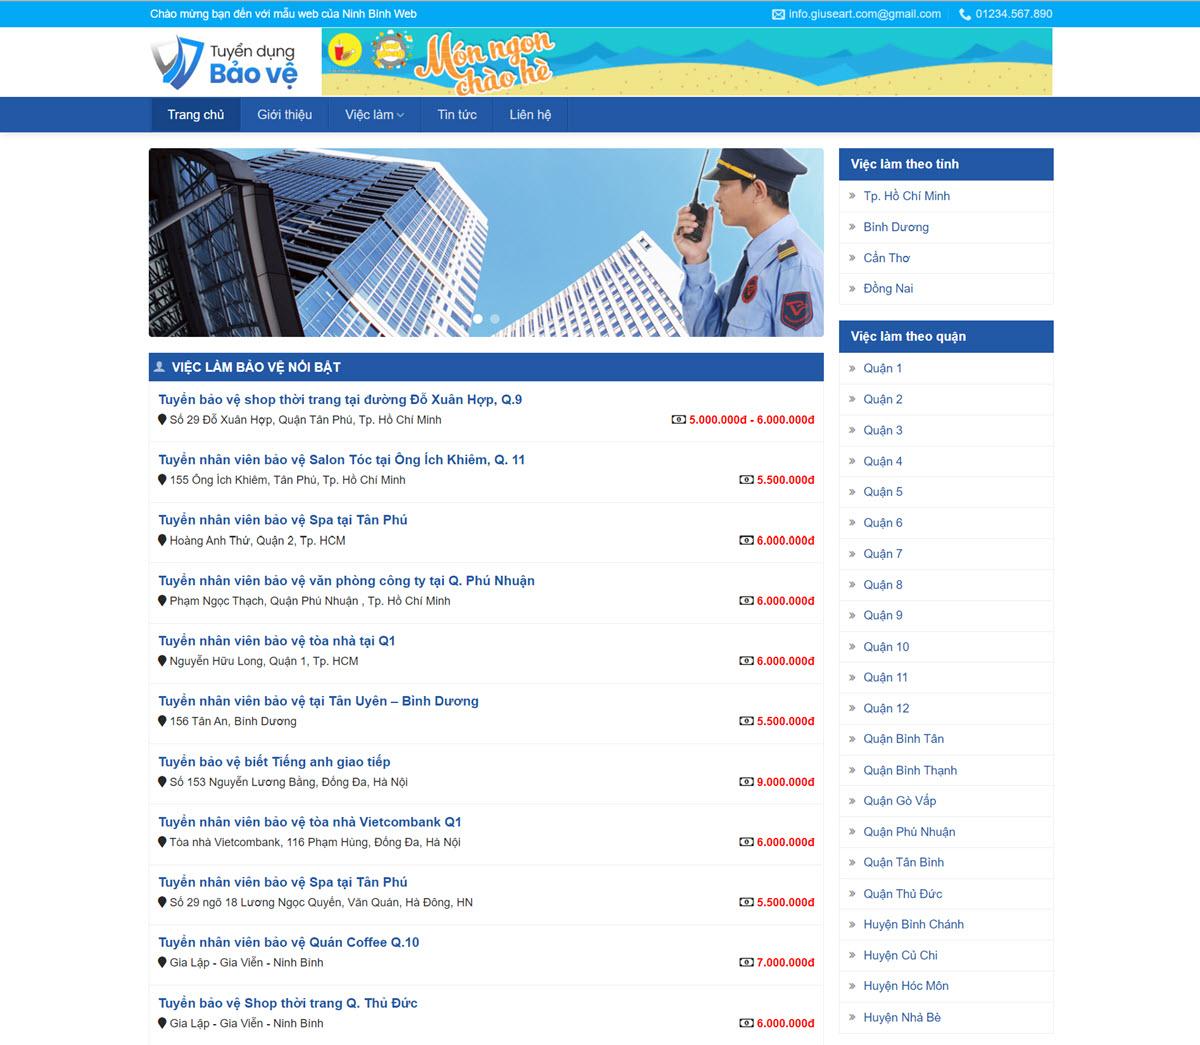 mau-website-viec-lam-bao-ve